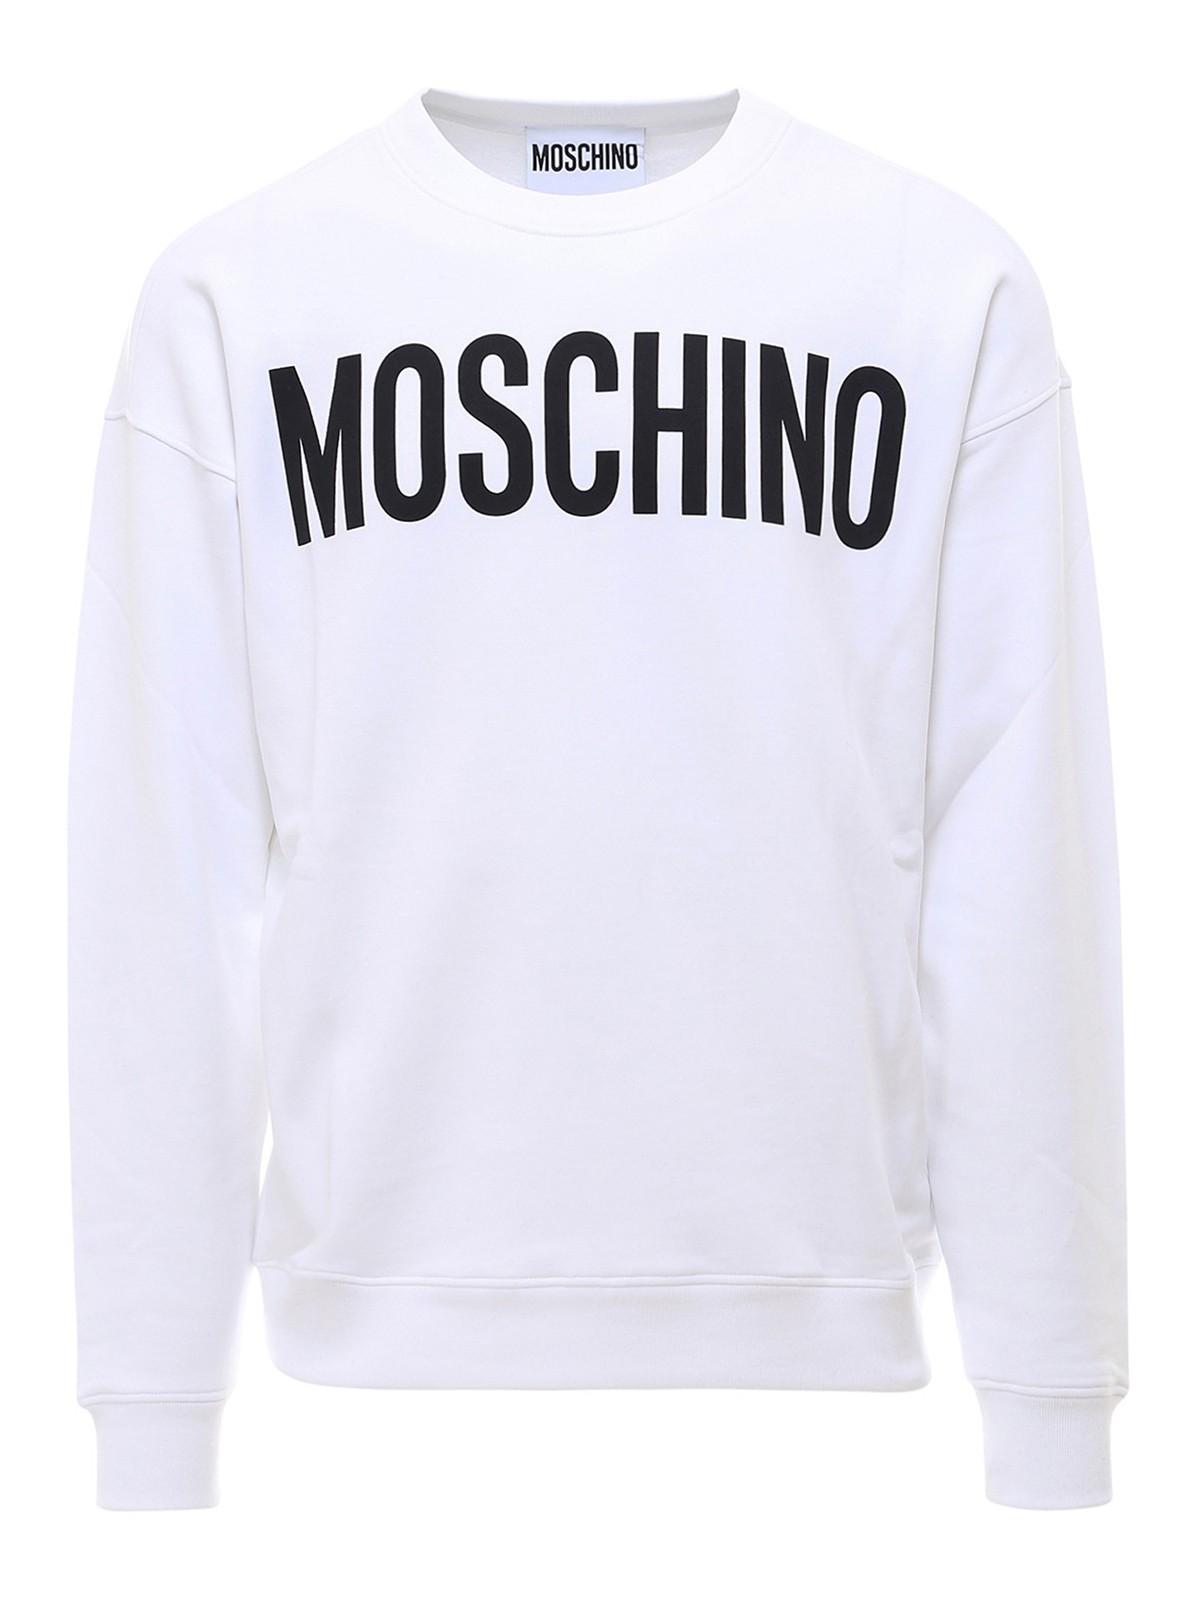 Moschino LOGO LETTERING SWEATSHIRT